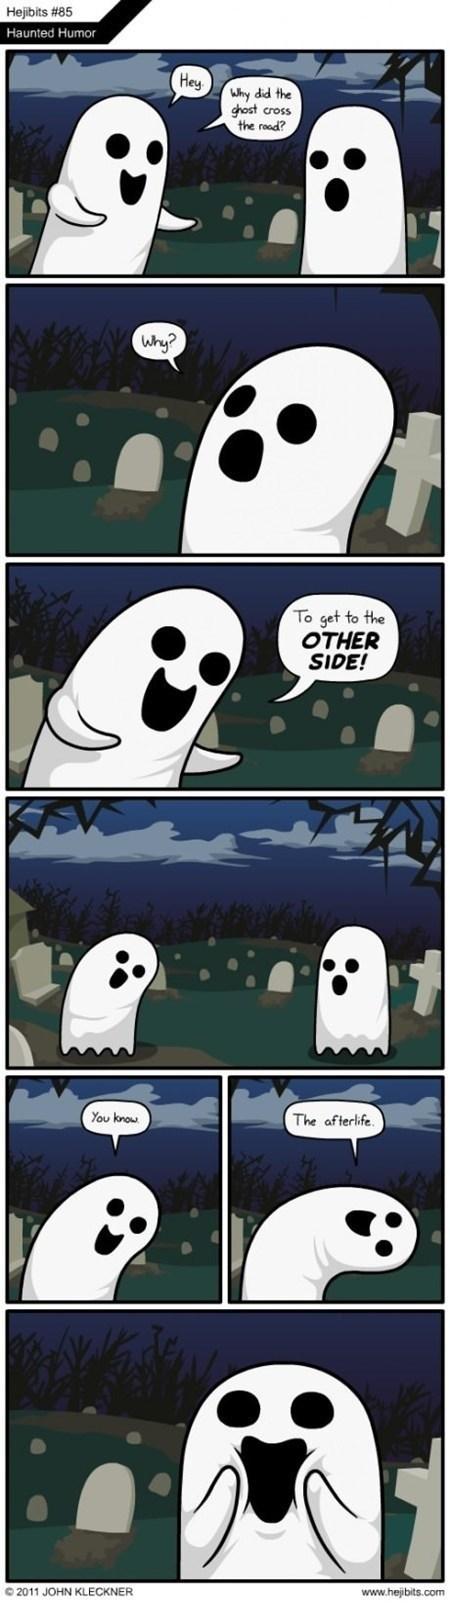 ghosts graveyard jokes Memes the internets - 6448840960